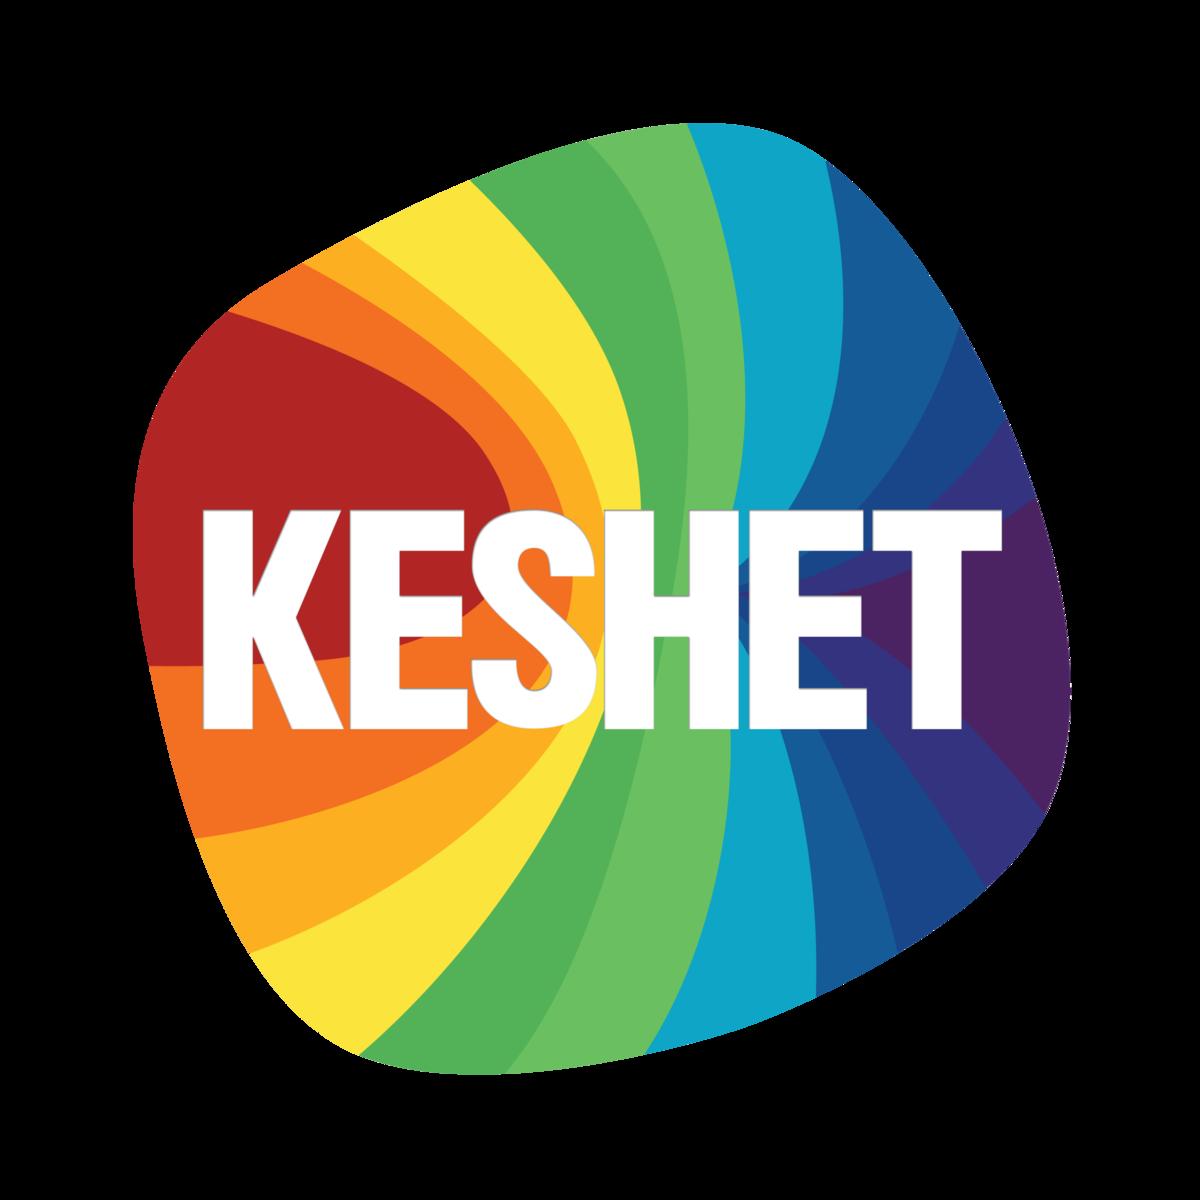 Keshet Media Group Wikipedia Hbo, Game show, Film movie